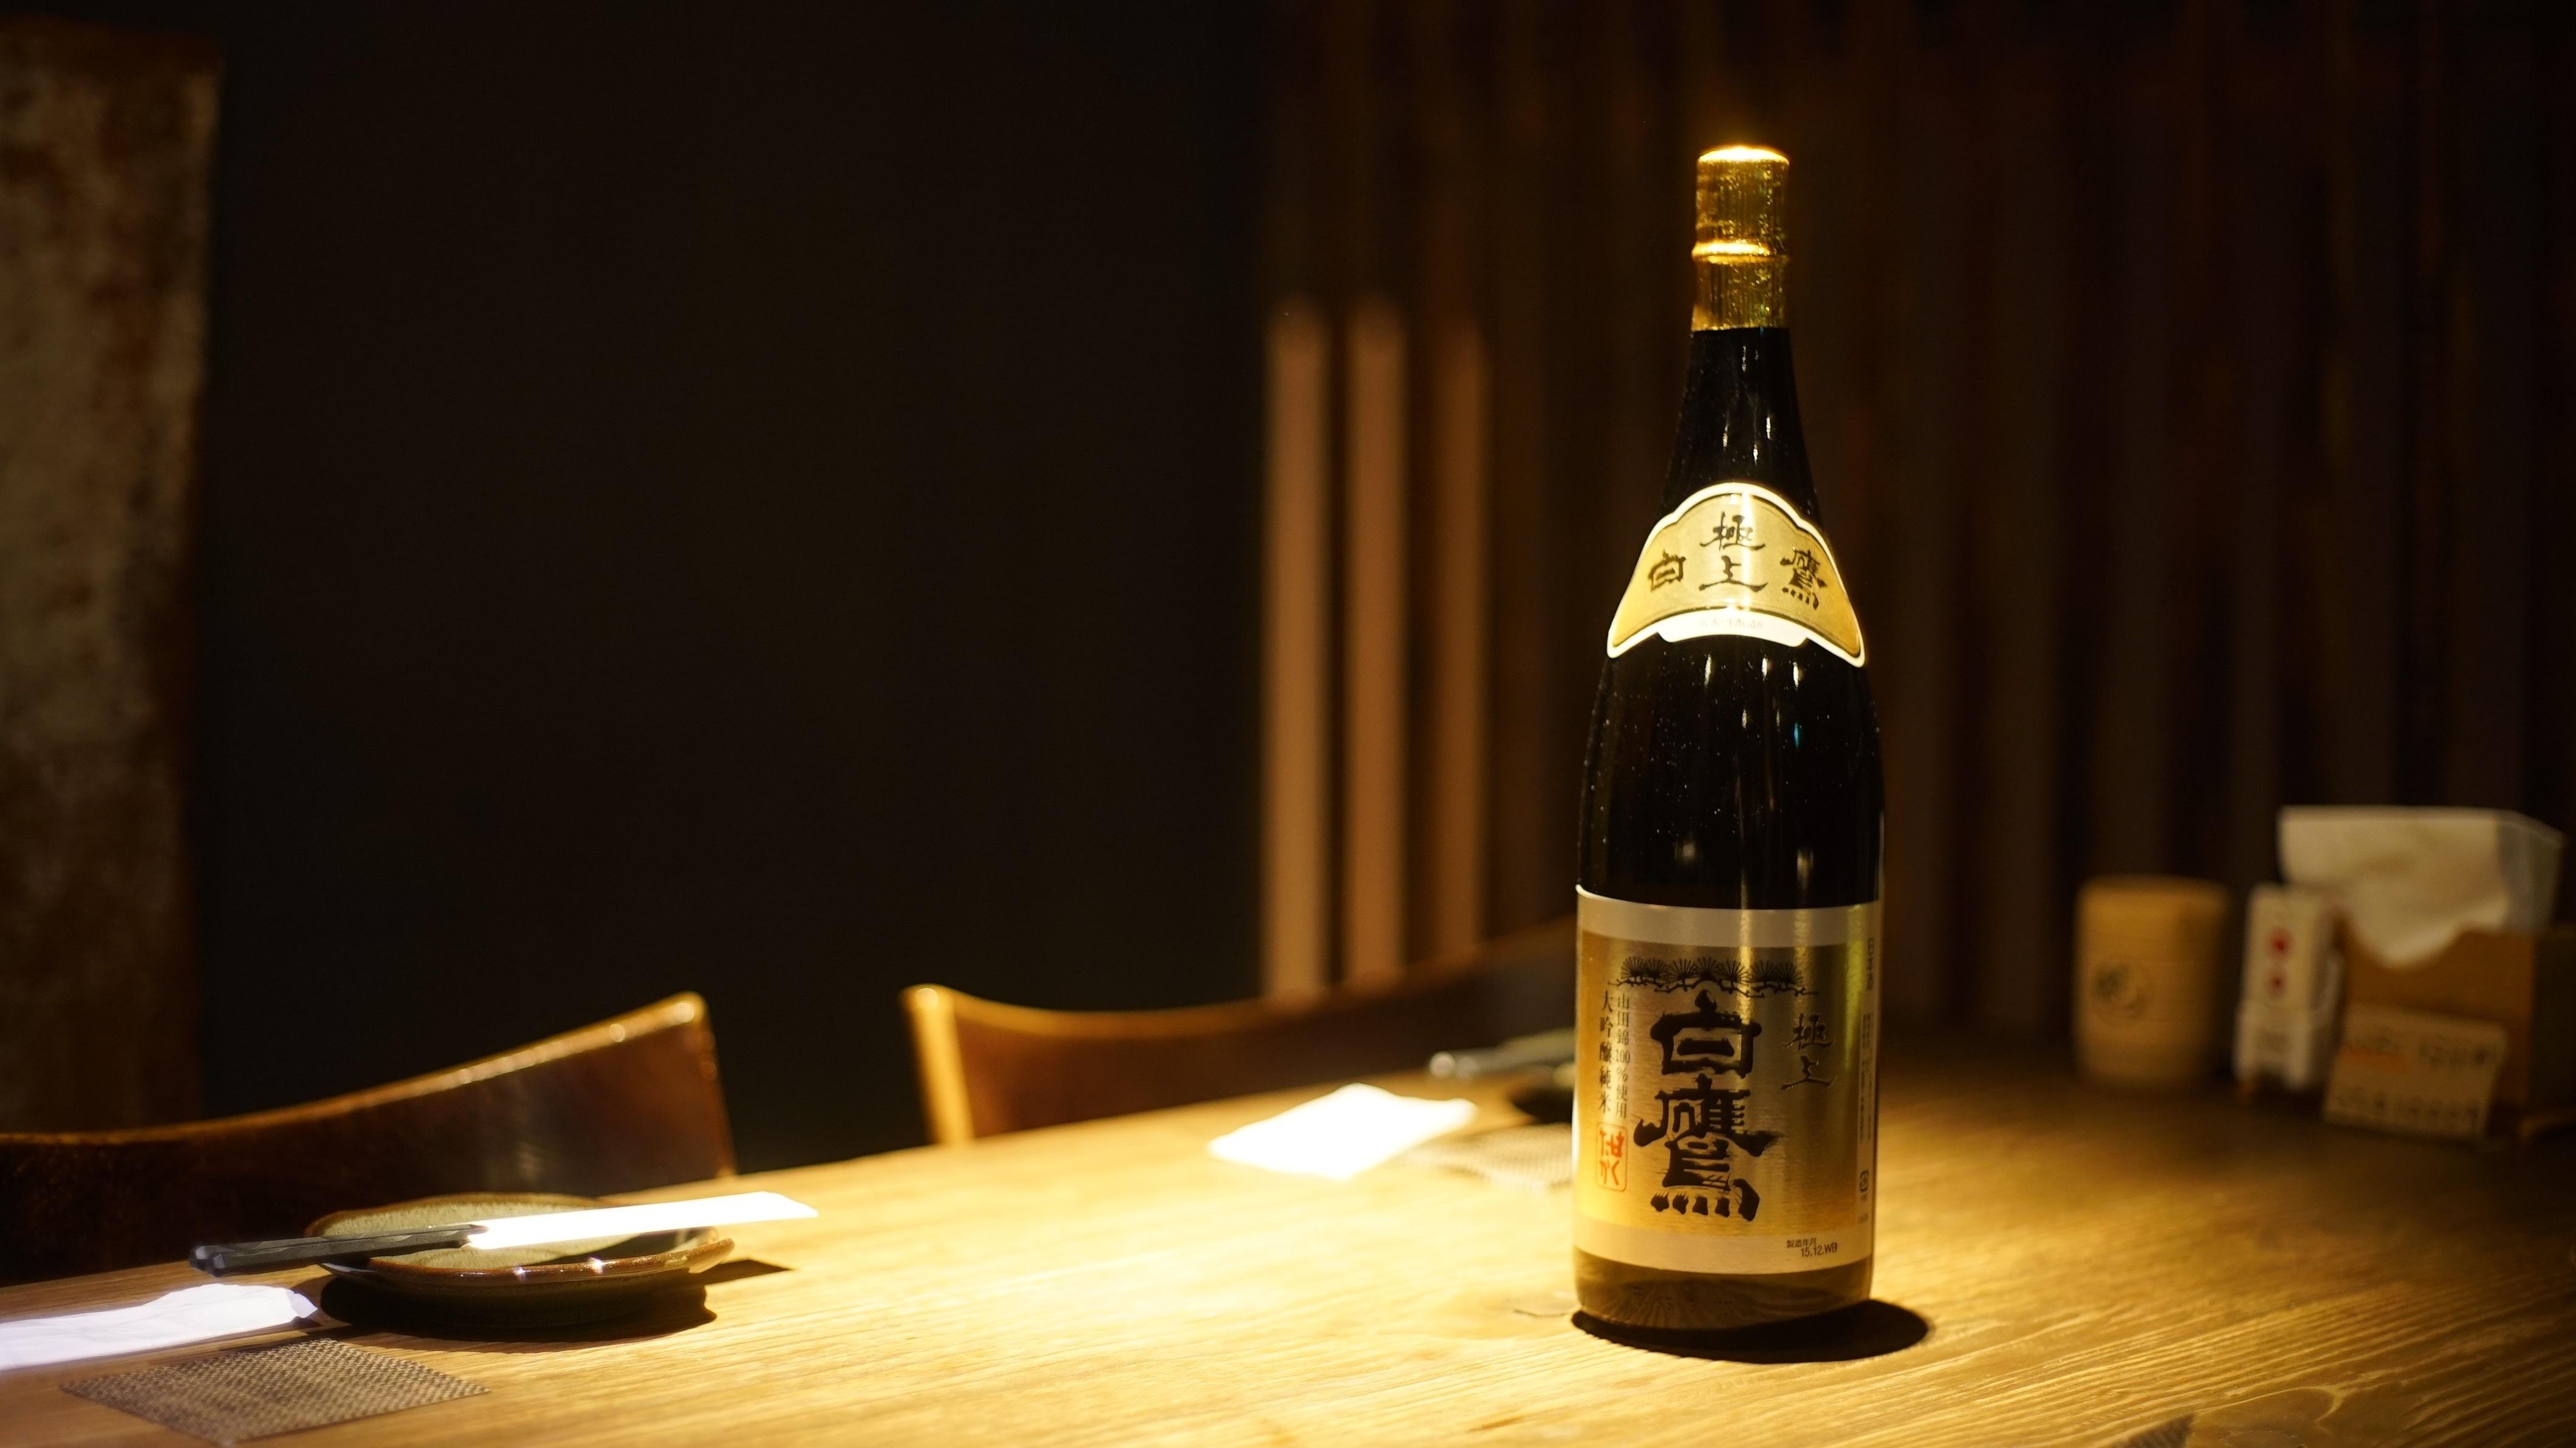 japanese-sake-bottle